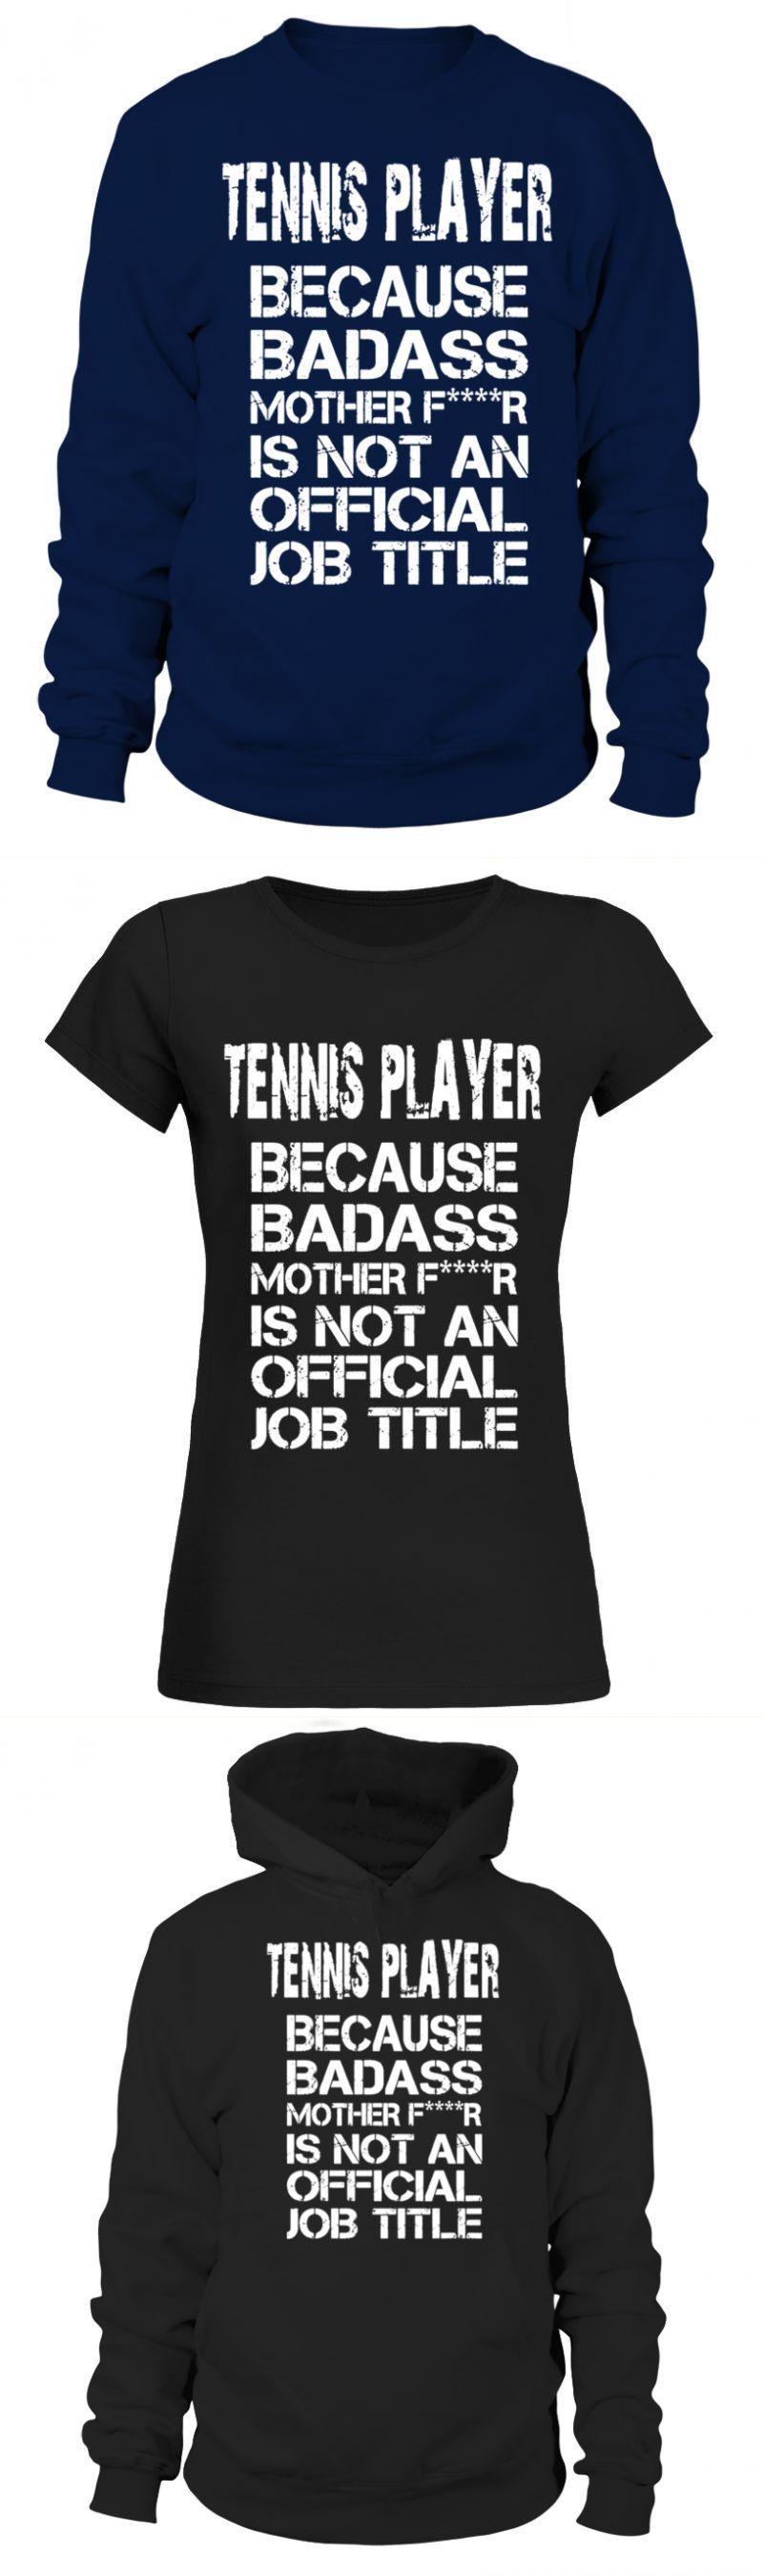 Tennis player because badass mother tshirts tennis t shirt ...